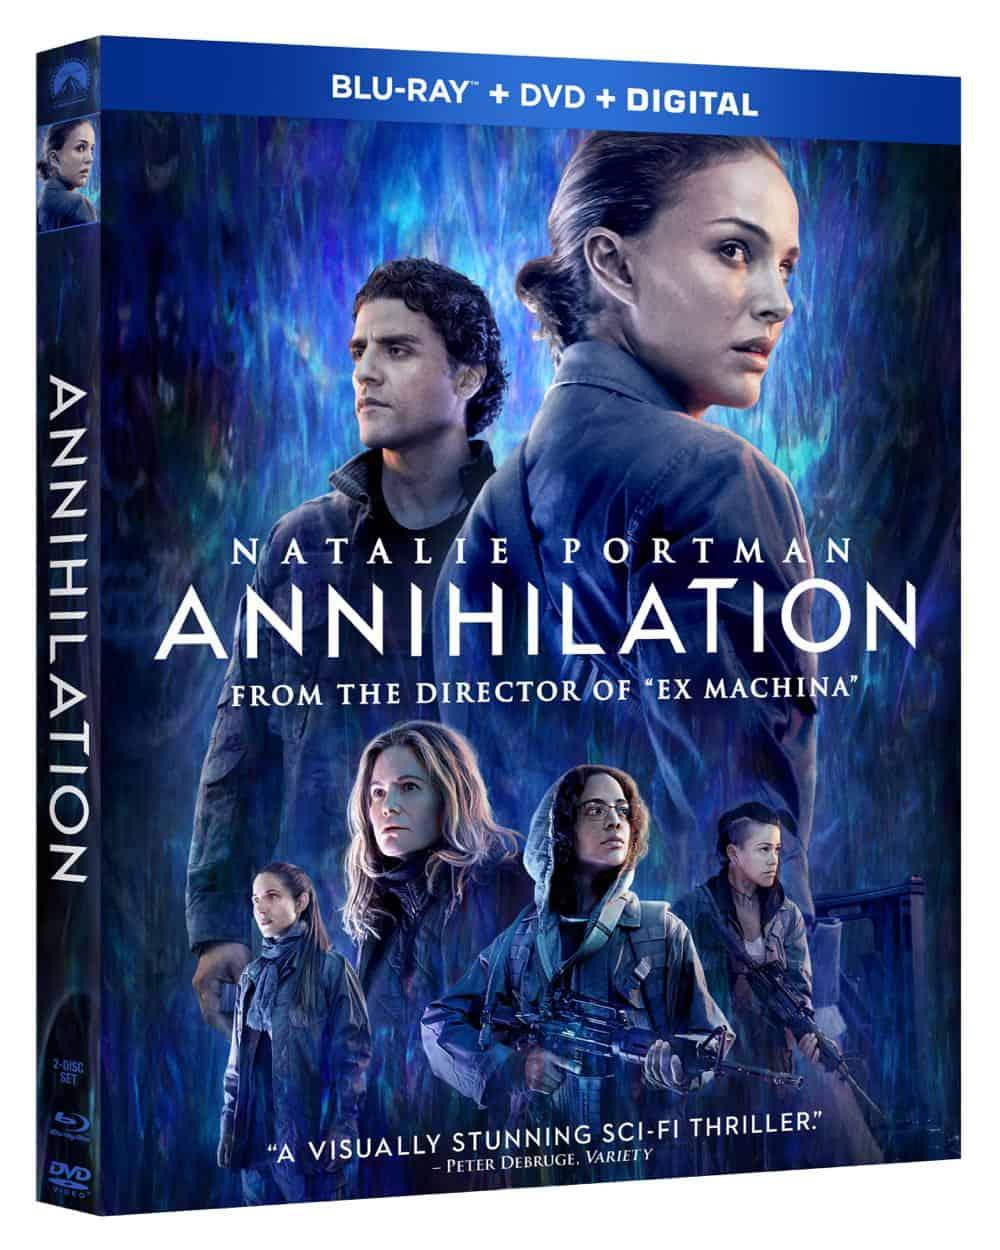 ANNIHILATION Blu-ray + DVD + Digital Cover